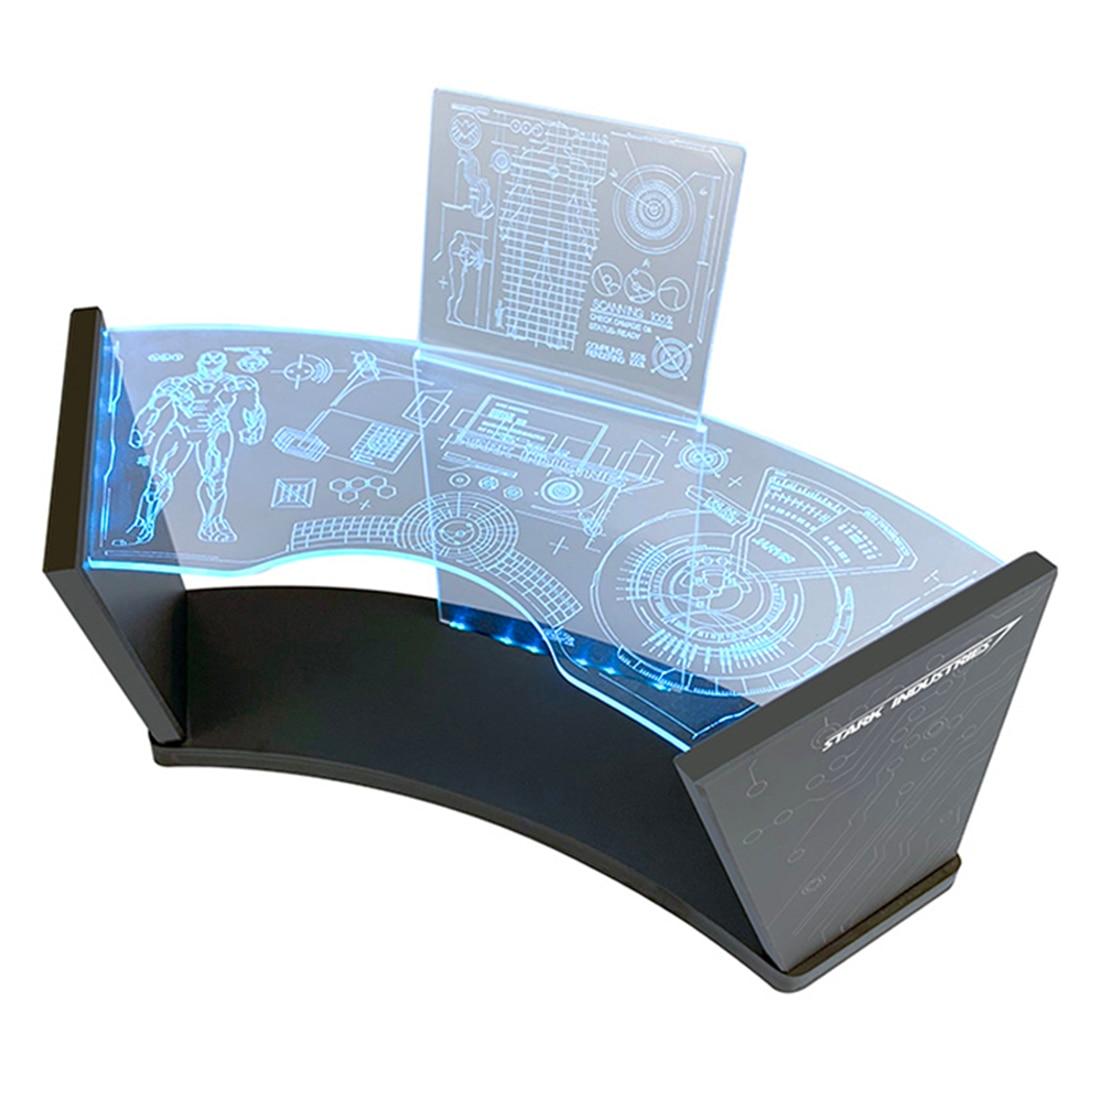 Debugging Scenarios Workbench Workshop Scene Test Desk with Blue LED for 1/6 Hottoys Series Model Iron Man Tony Stark (DC Plug)